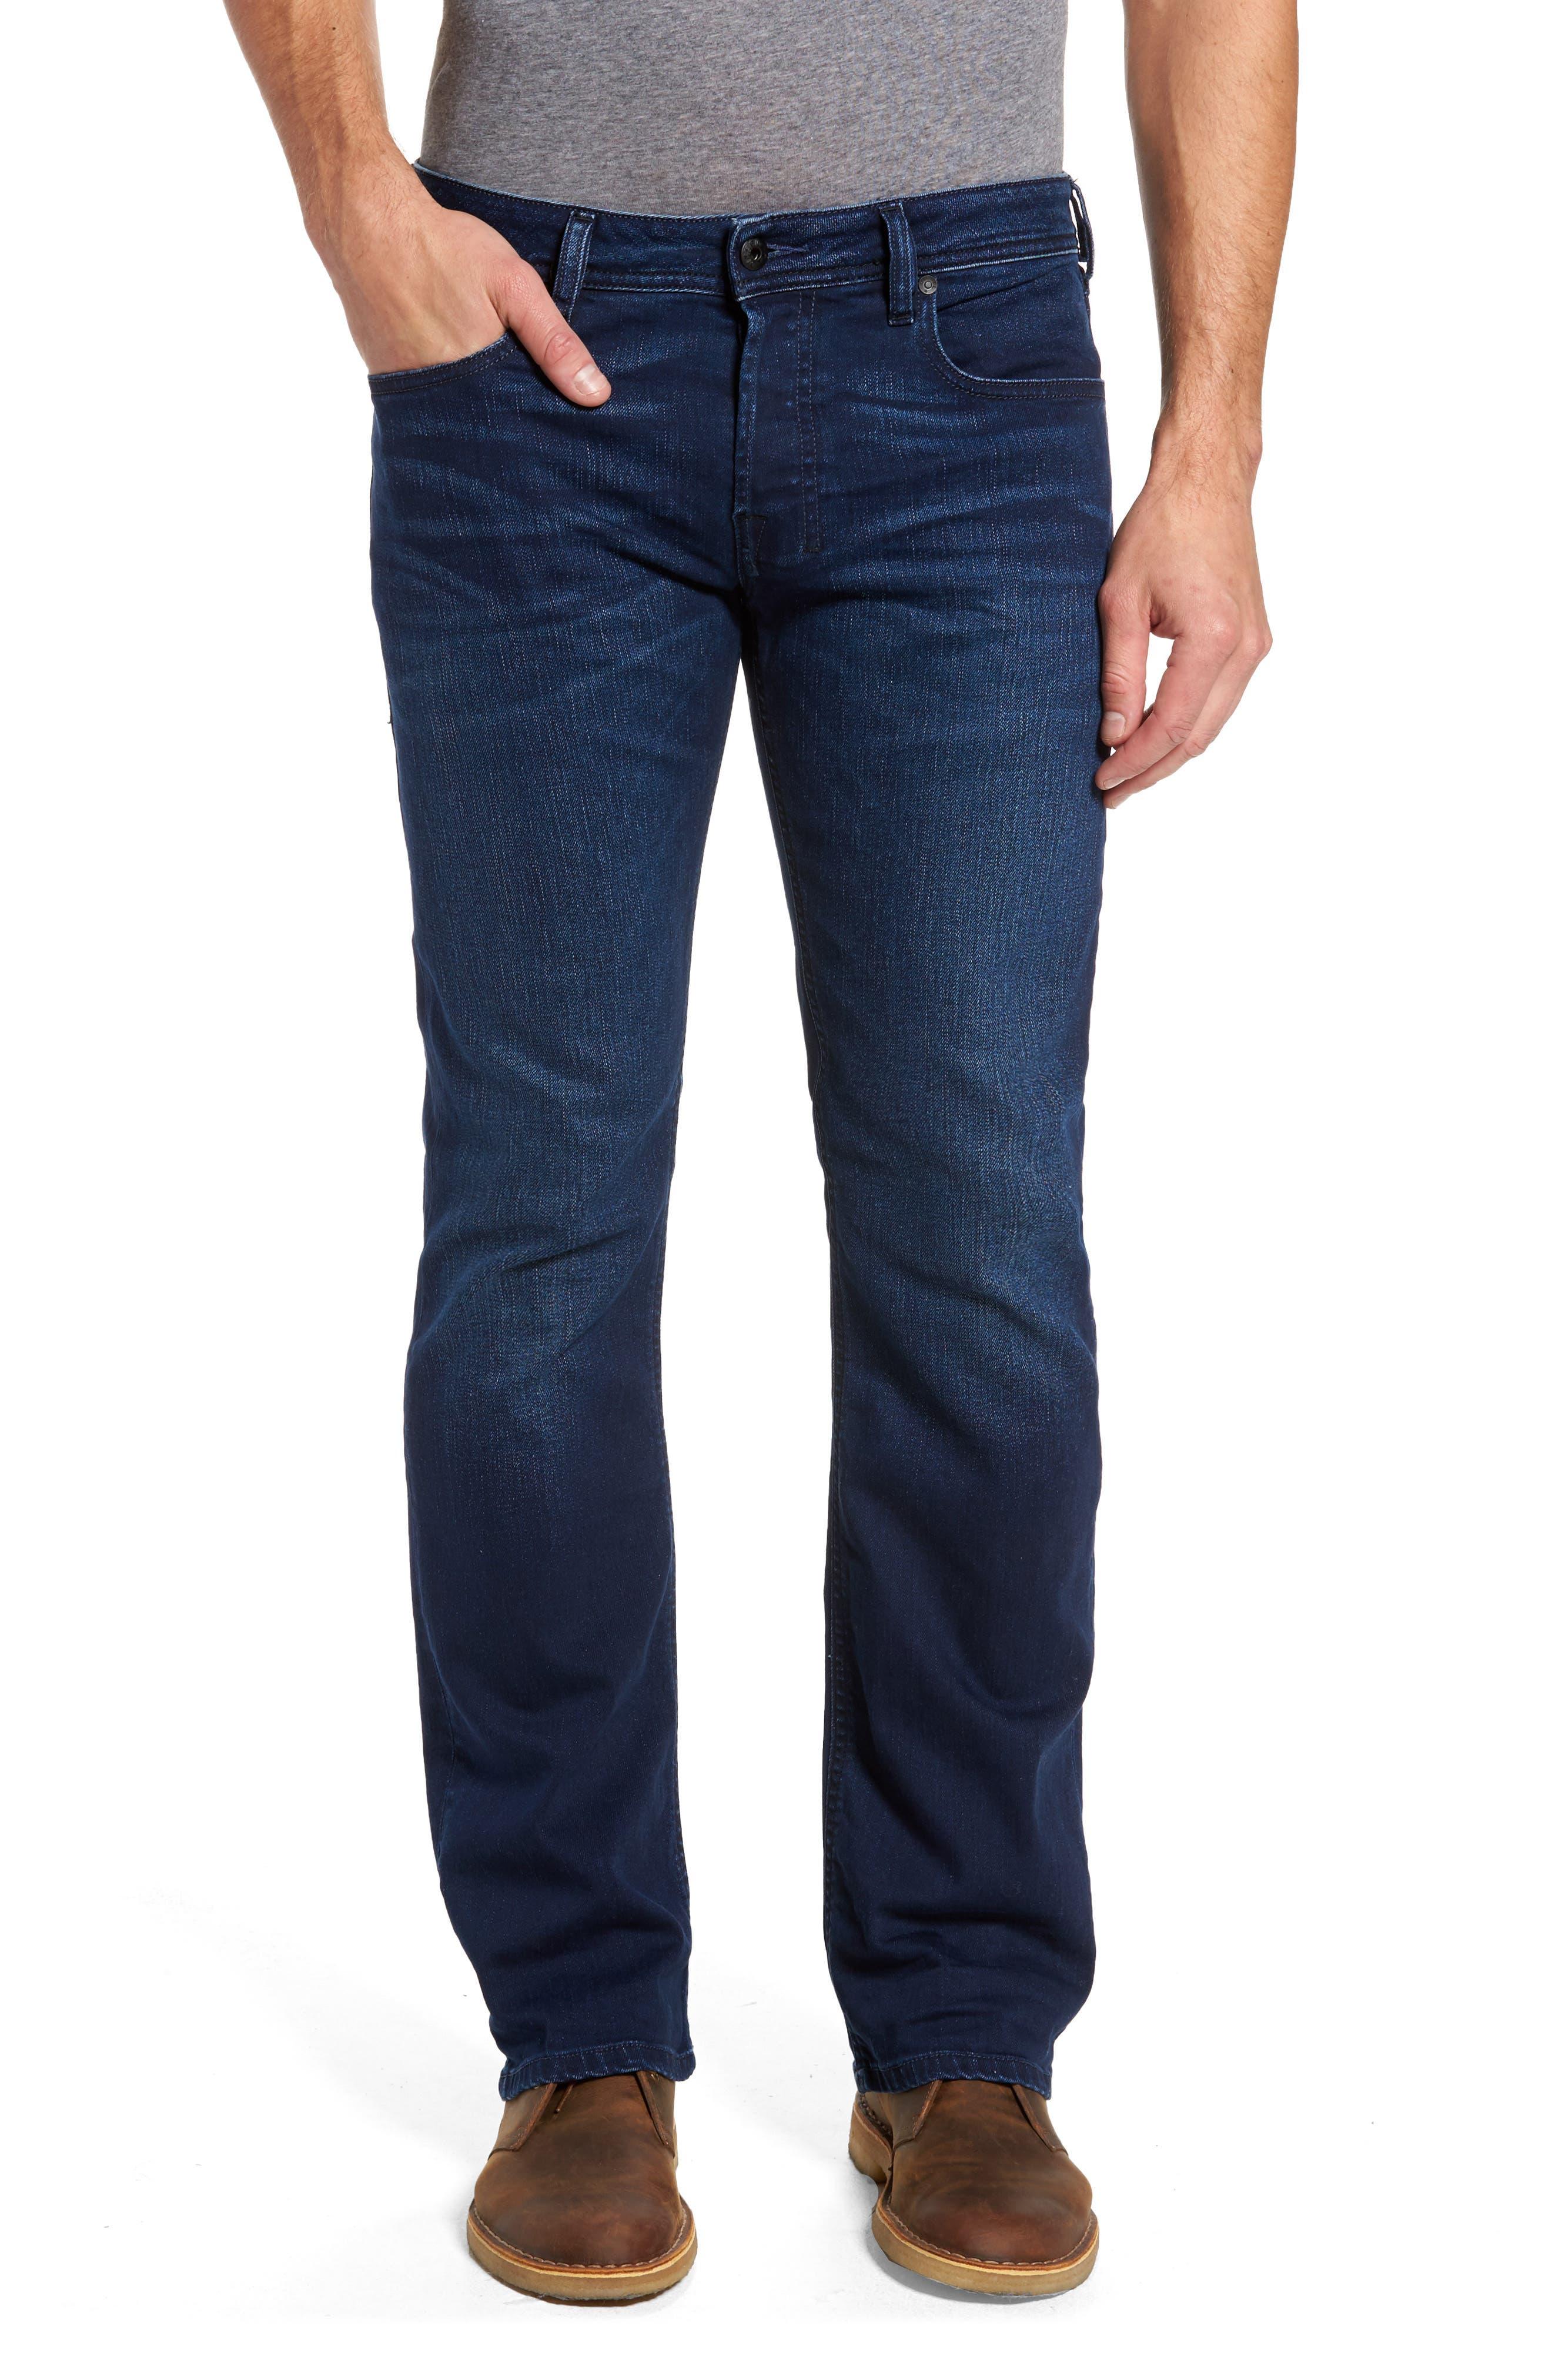 Zatiny Bootcut Jeans,                             Main thumbnail 1, color,                             84Hj